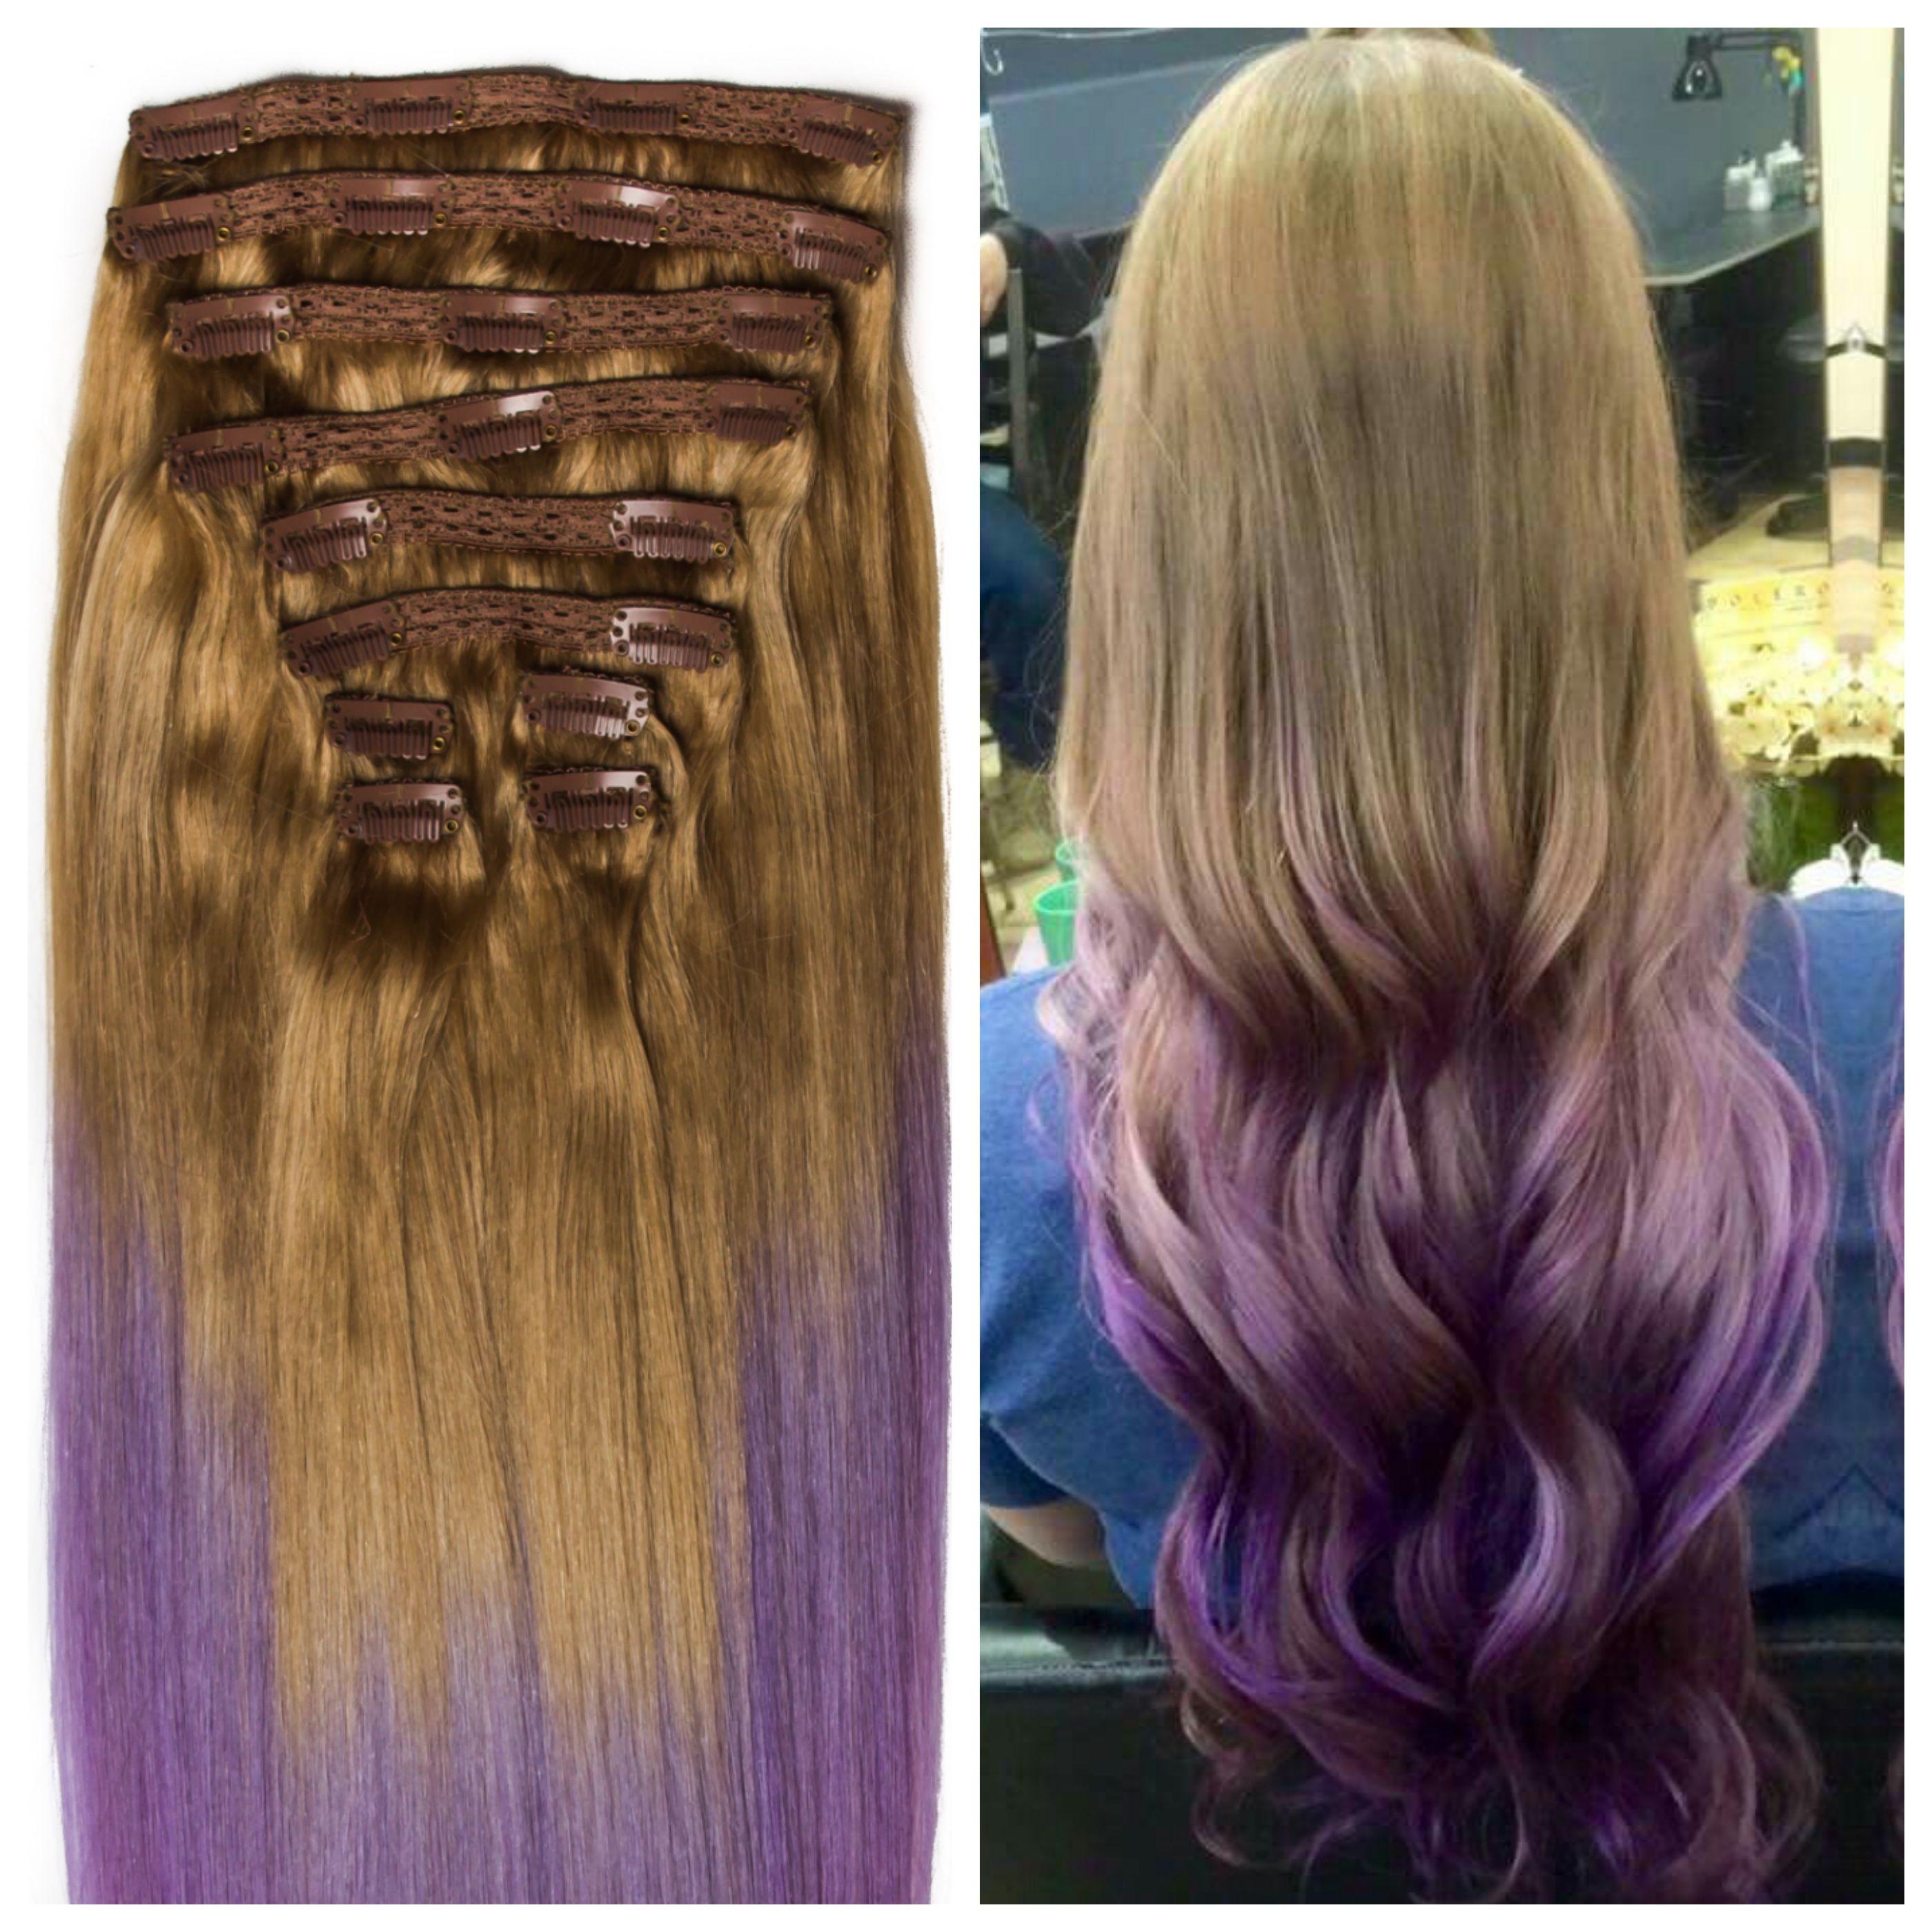 Extensii Clip On Premium Blond Alunamov Hair Extensions Poze